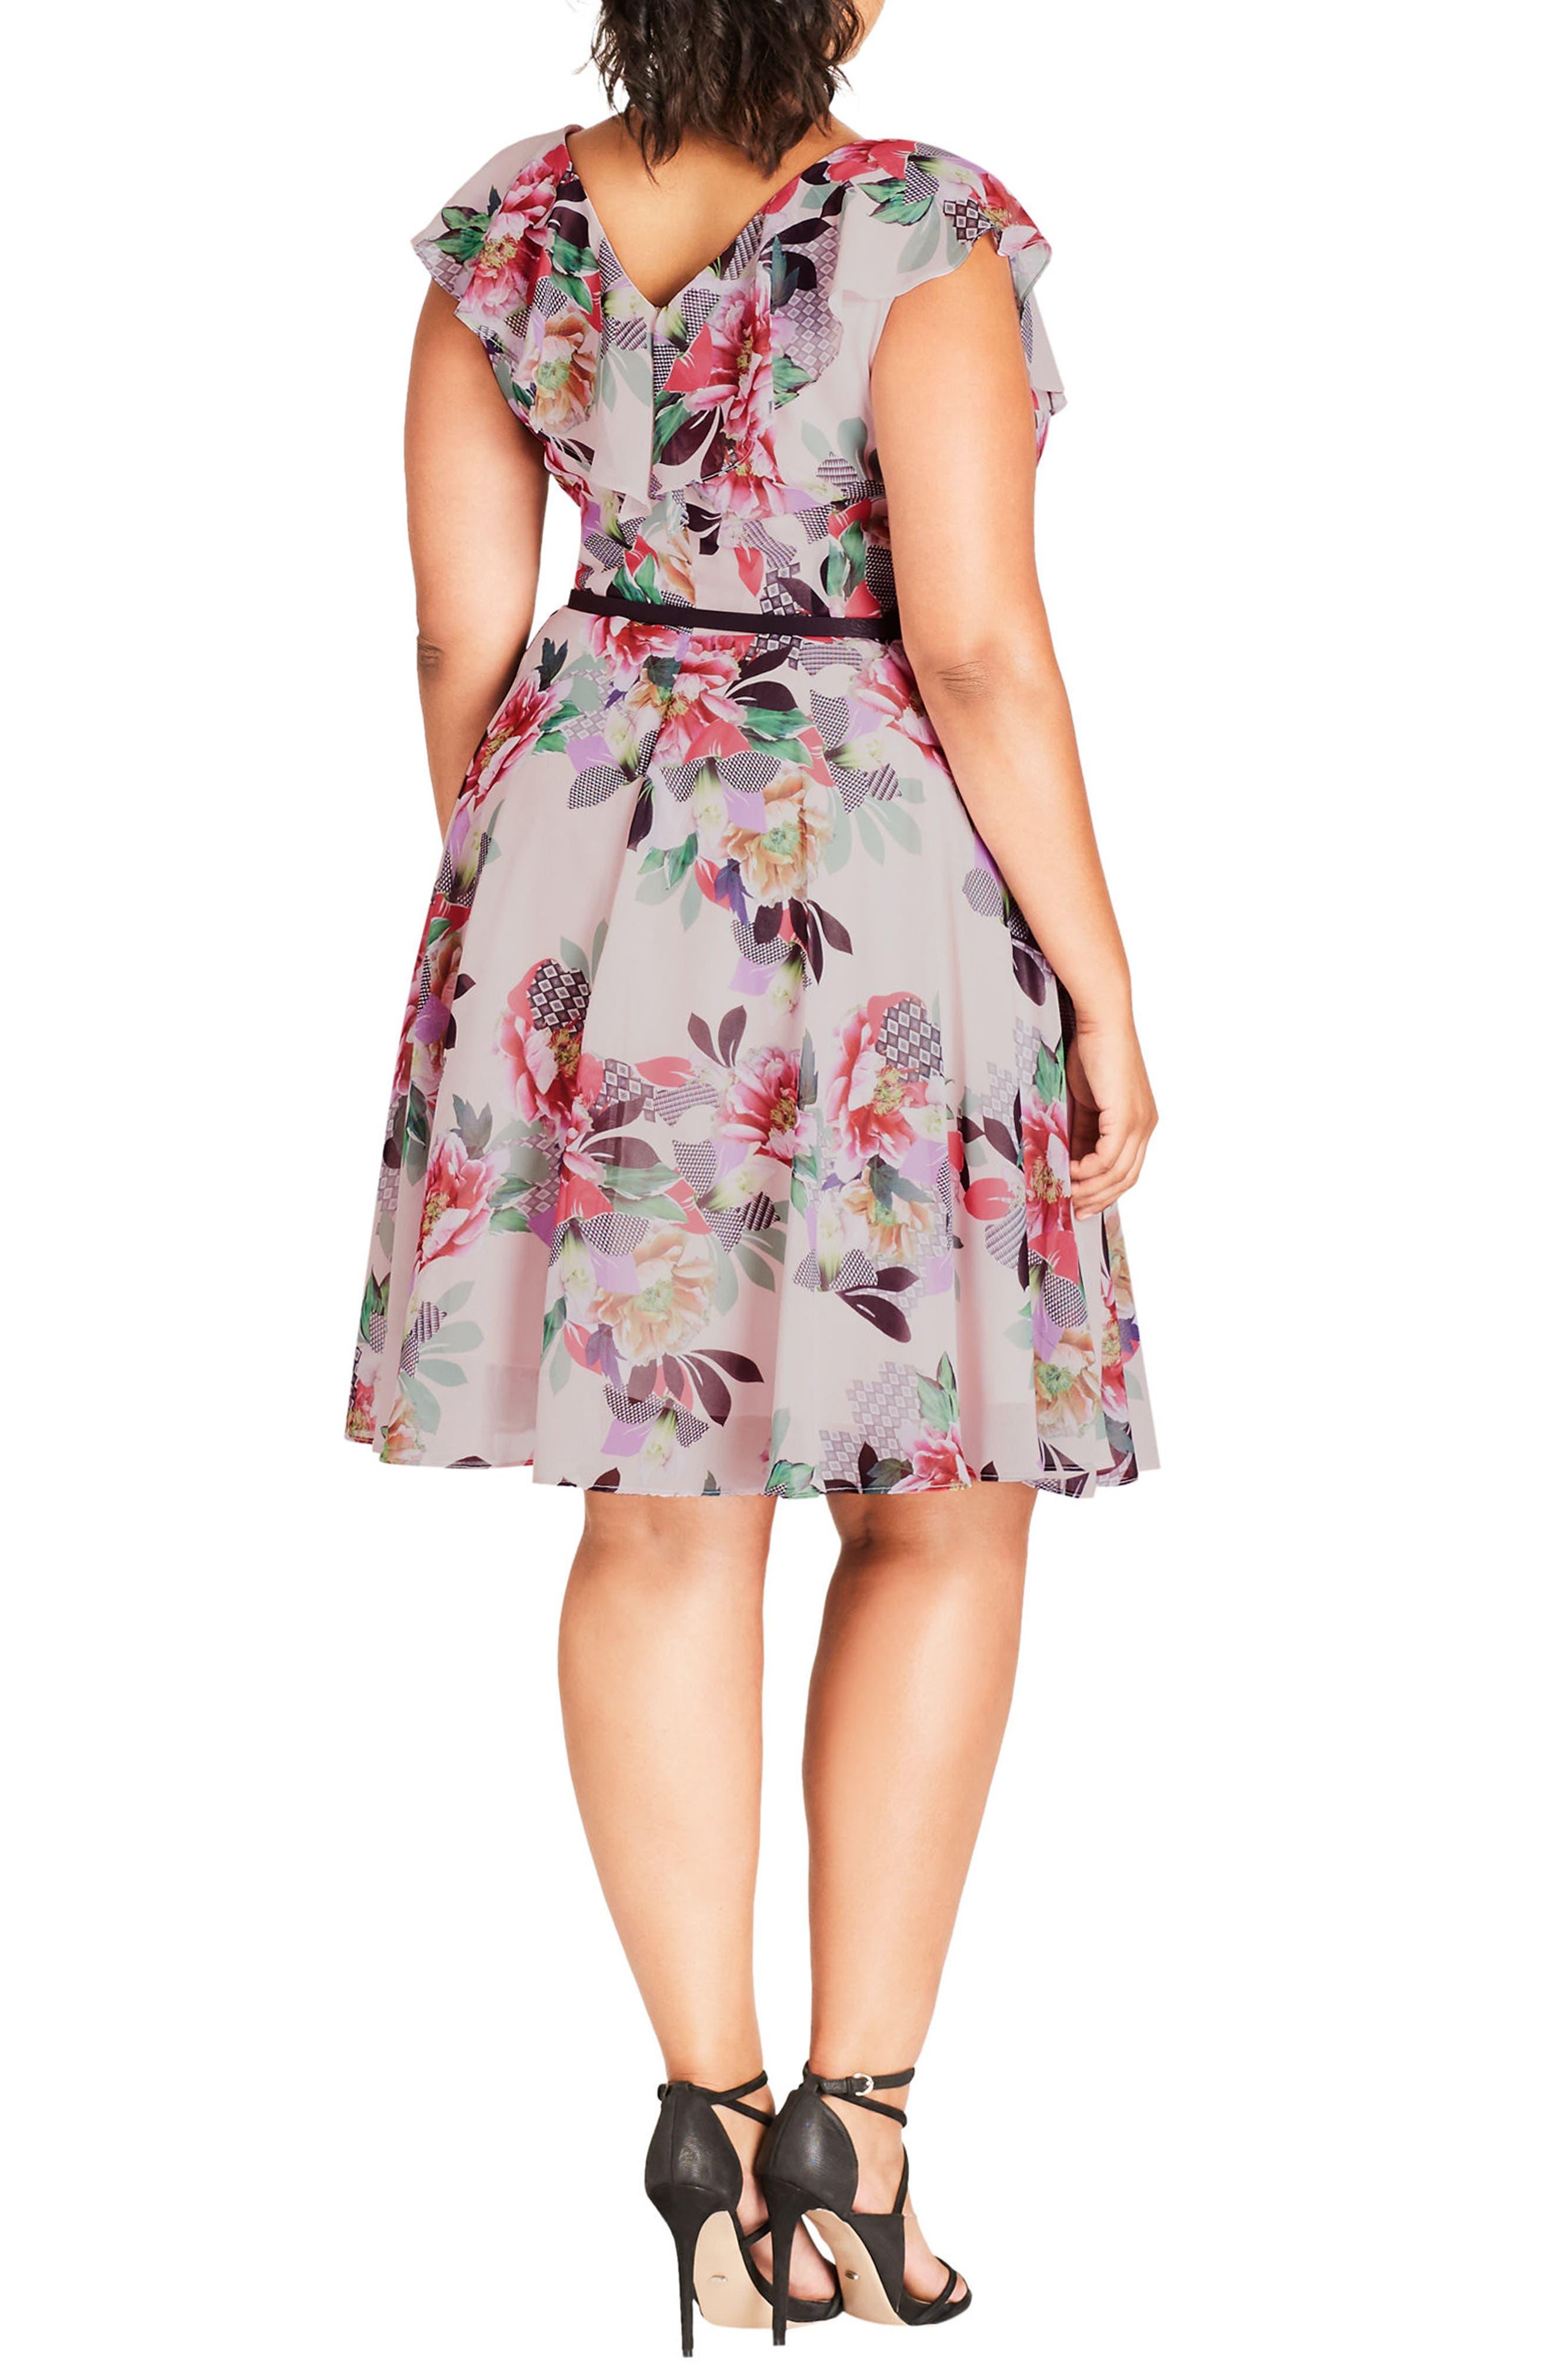 Romance Ruffle Floral Fit & Flare Dress,                             Alternate thumbnail 2, color,                             Lipstick Floral